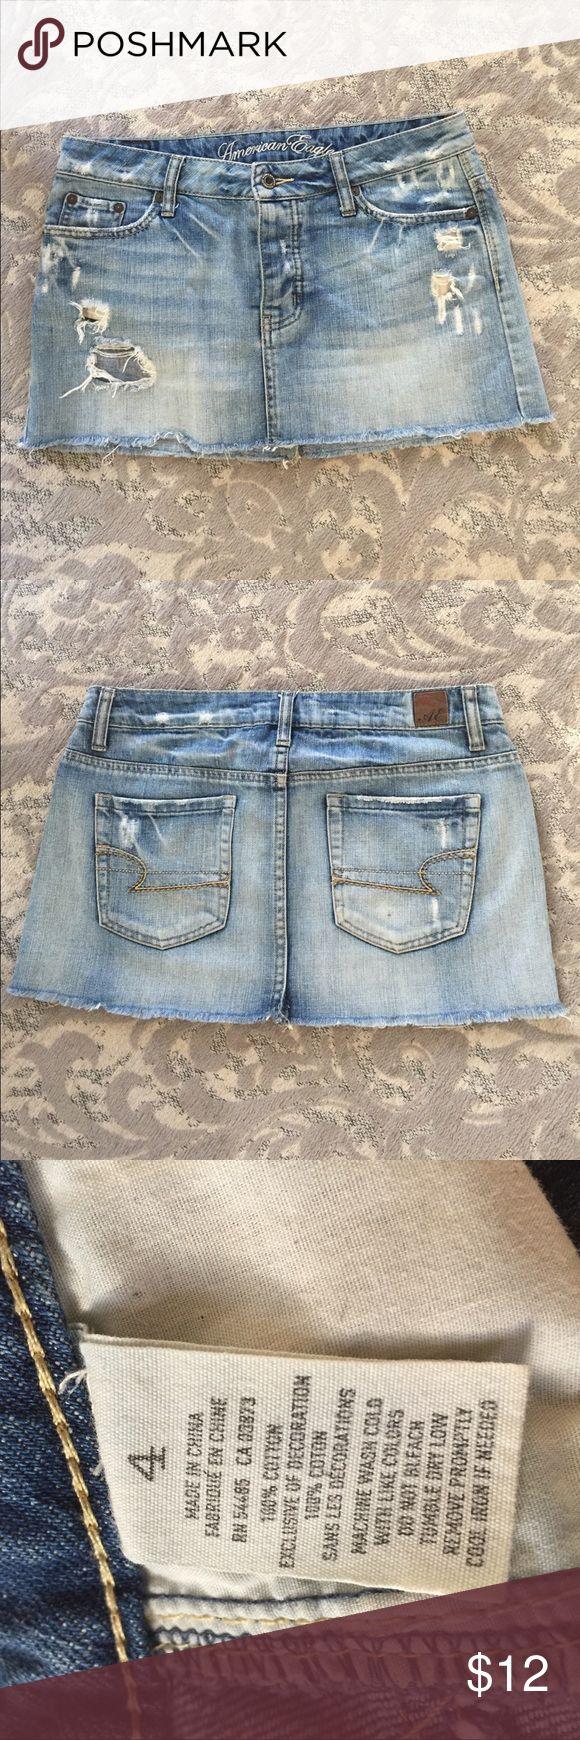 American eagle distressed skirt American eagle distressed Jean skirt. Size 4. American Eagle Outfitters Skirts Mini